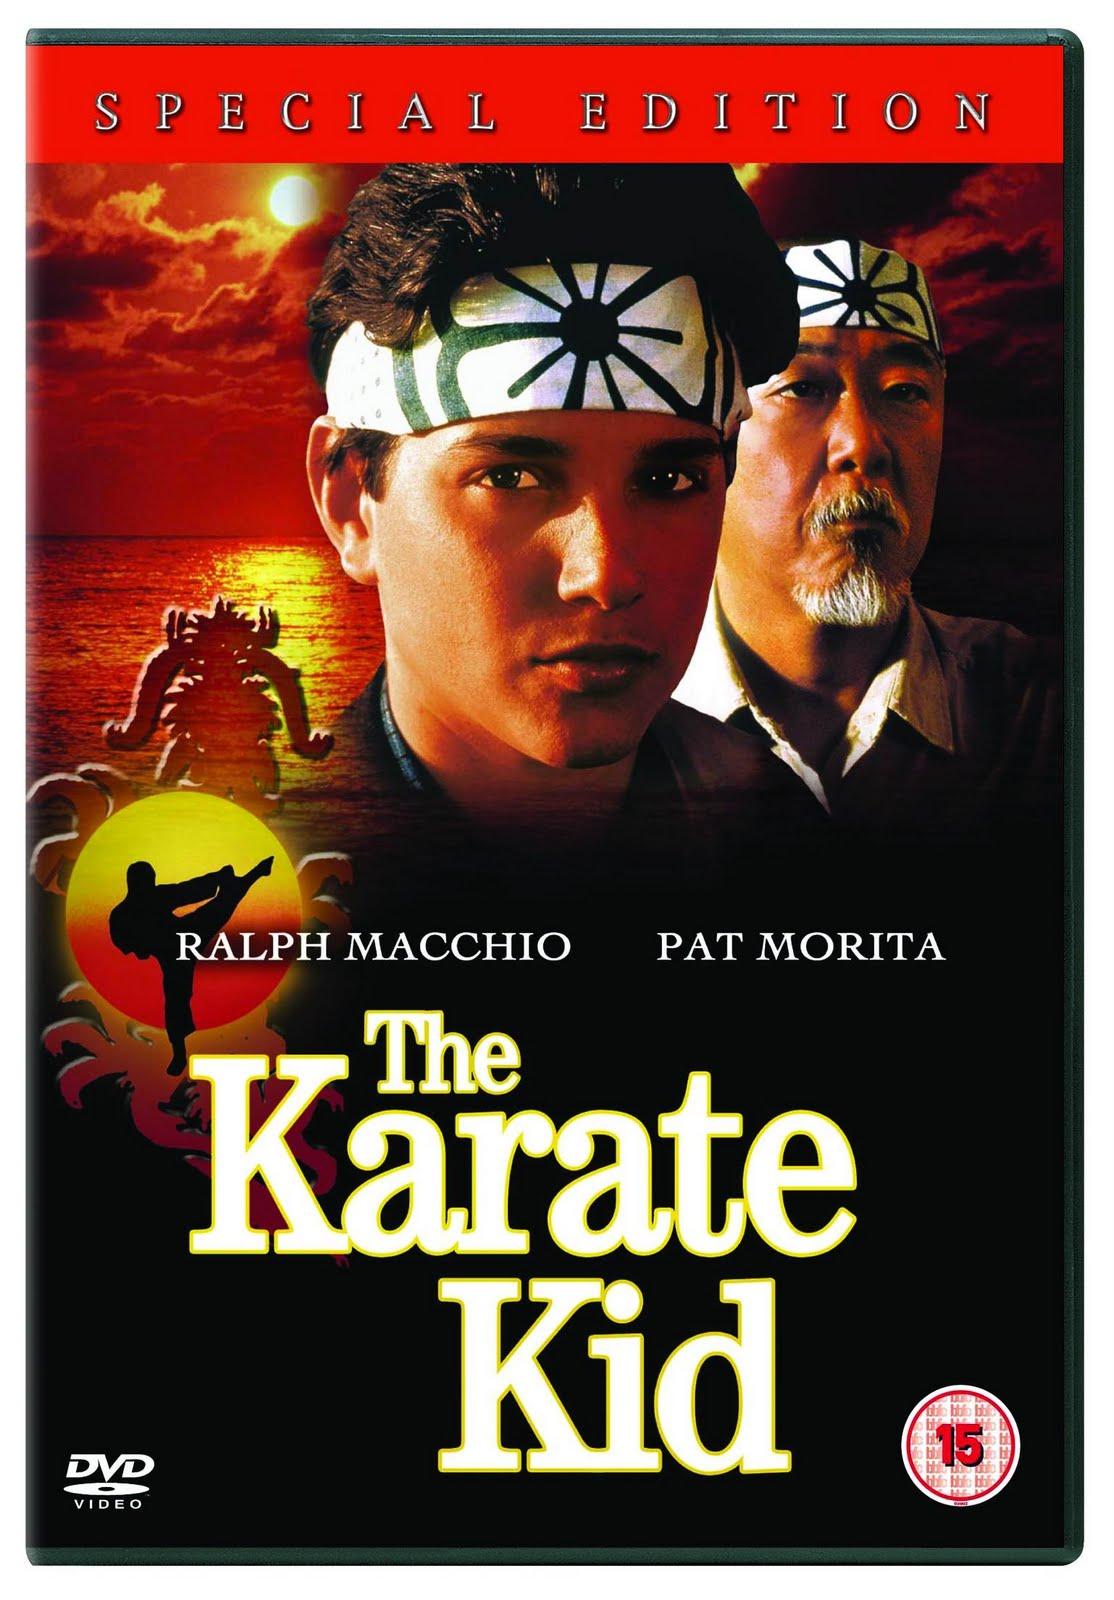 http://3.bp.blogspot.com/-0rDSd8vWhPM/TiRYxy2HSlI/AAAAAAAAD4Y/Ly2JtQ1urD8/s1600/karate_kid.jpg